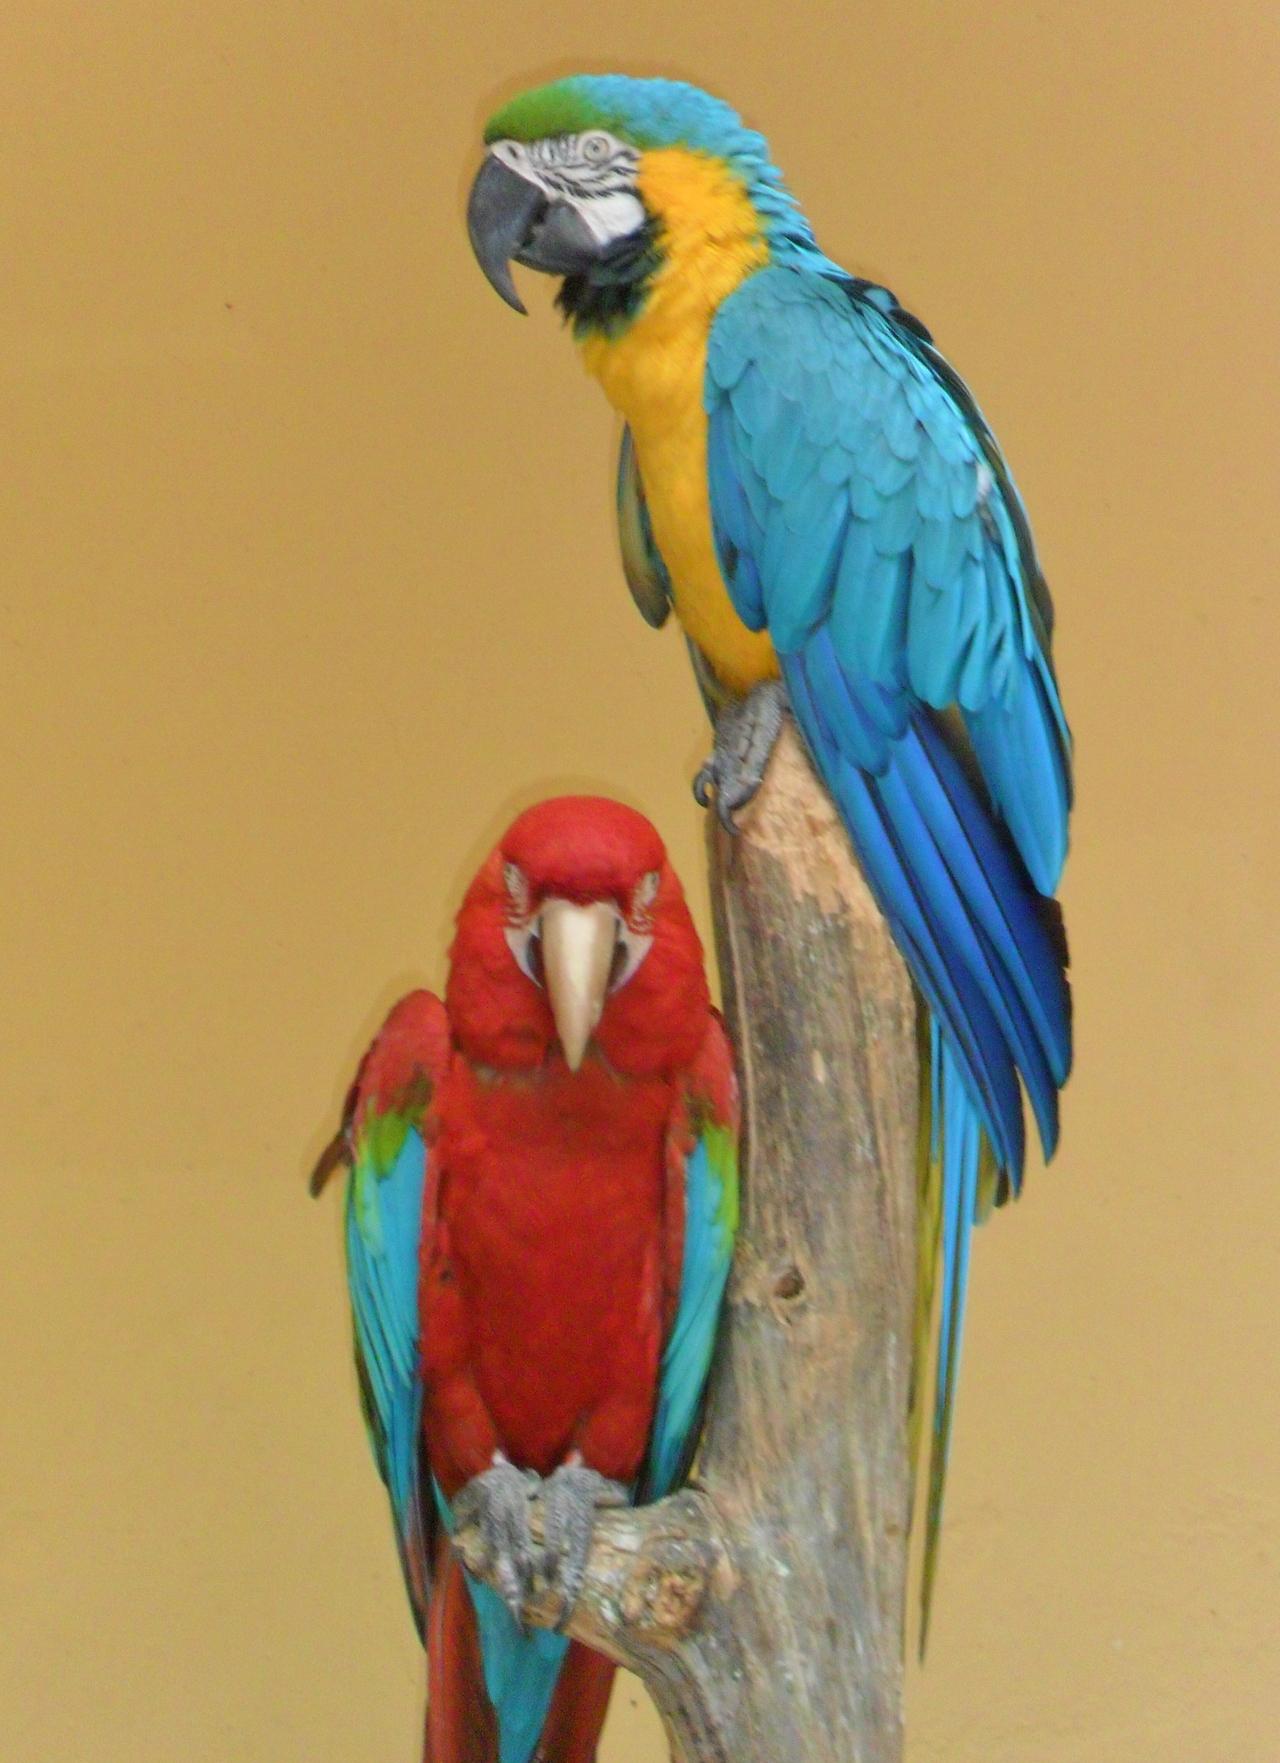 vwcampervan-aldridge: Colourful parrots, Gran Canaria, Canary Islands All Original Photography byhttp://vwcampervan-aldridge.tumblr.com